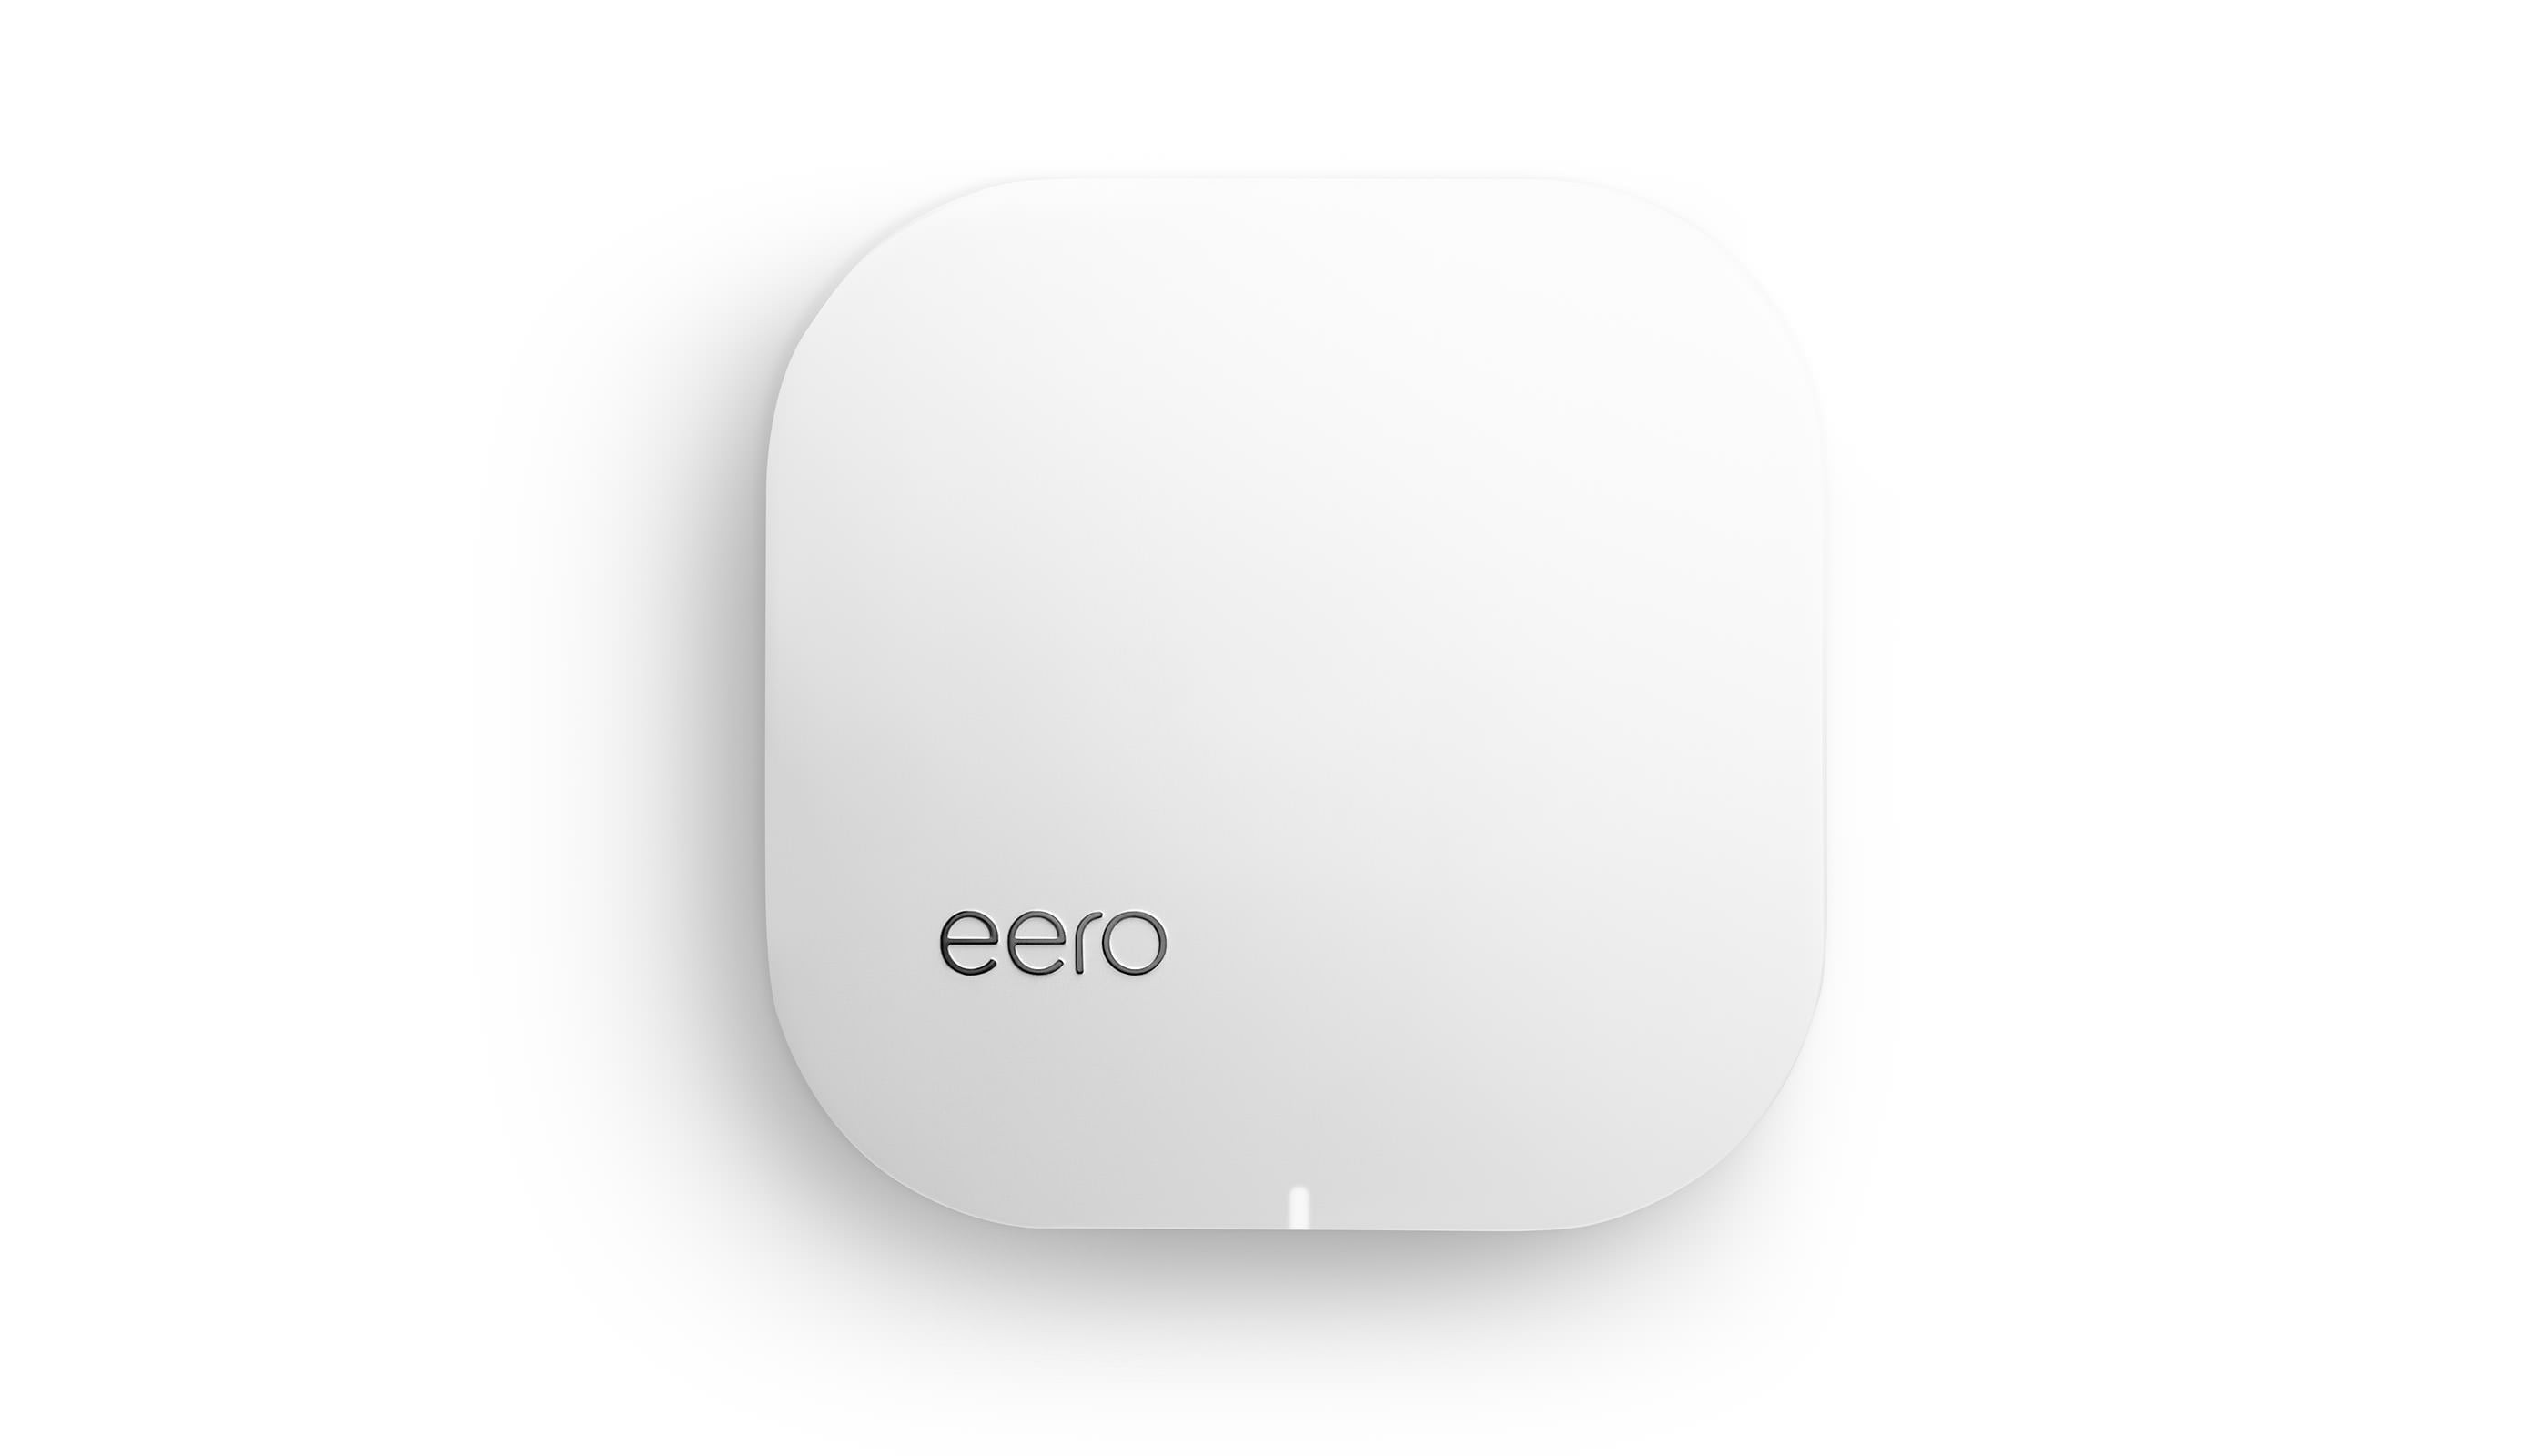 Eero, le routeur Wi-Fi du futur